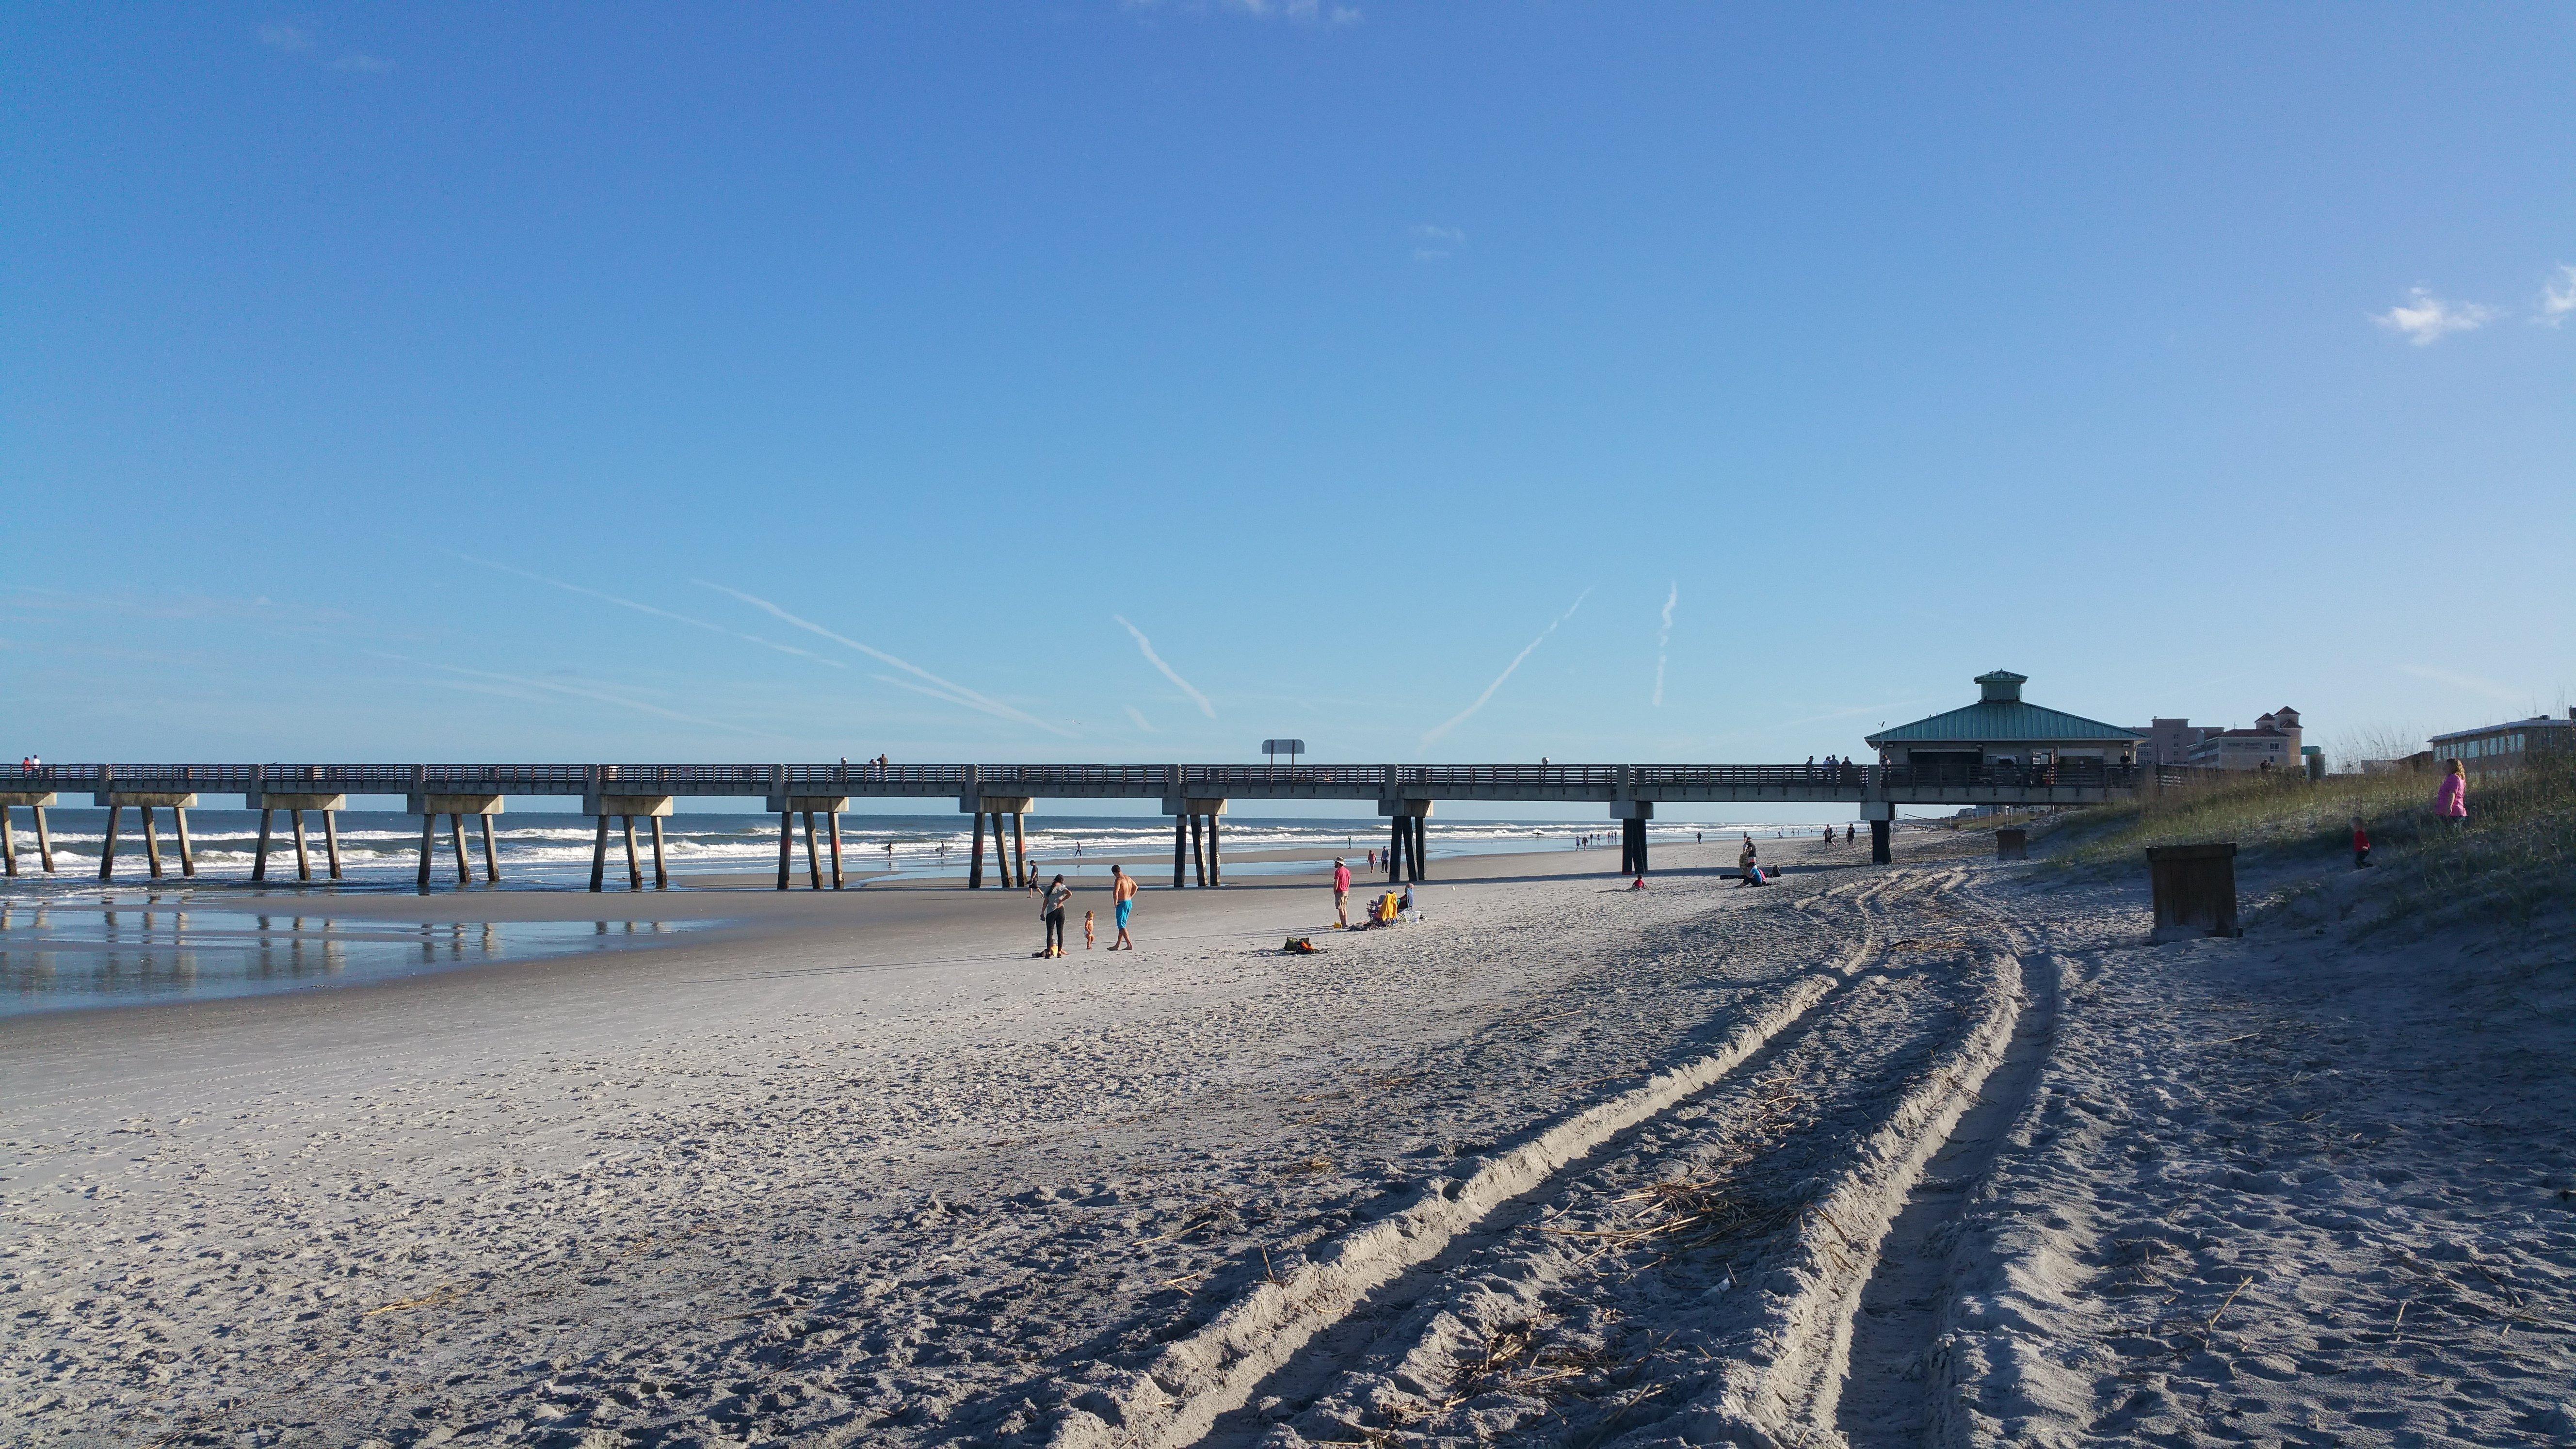 Atlantic Ocean NE Florida Jacksonville Beach Pier